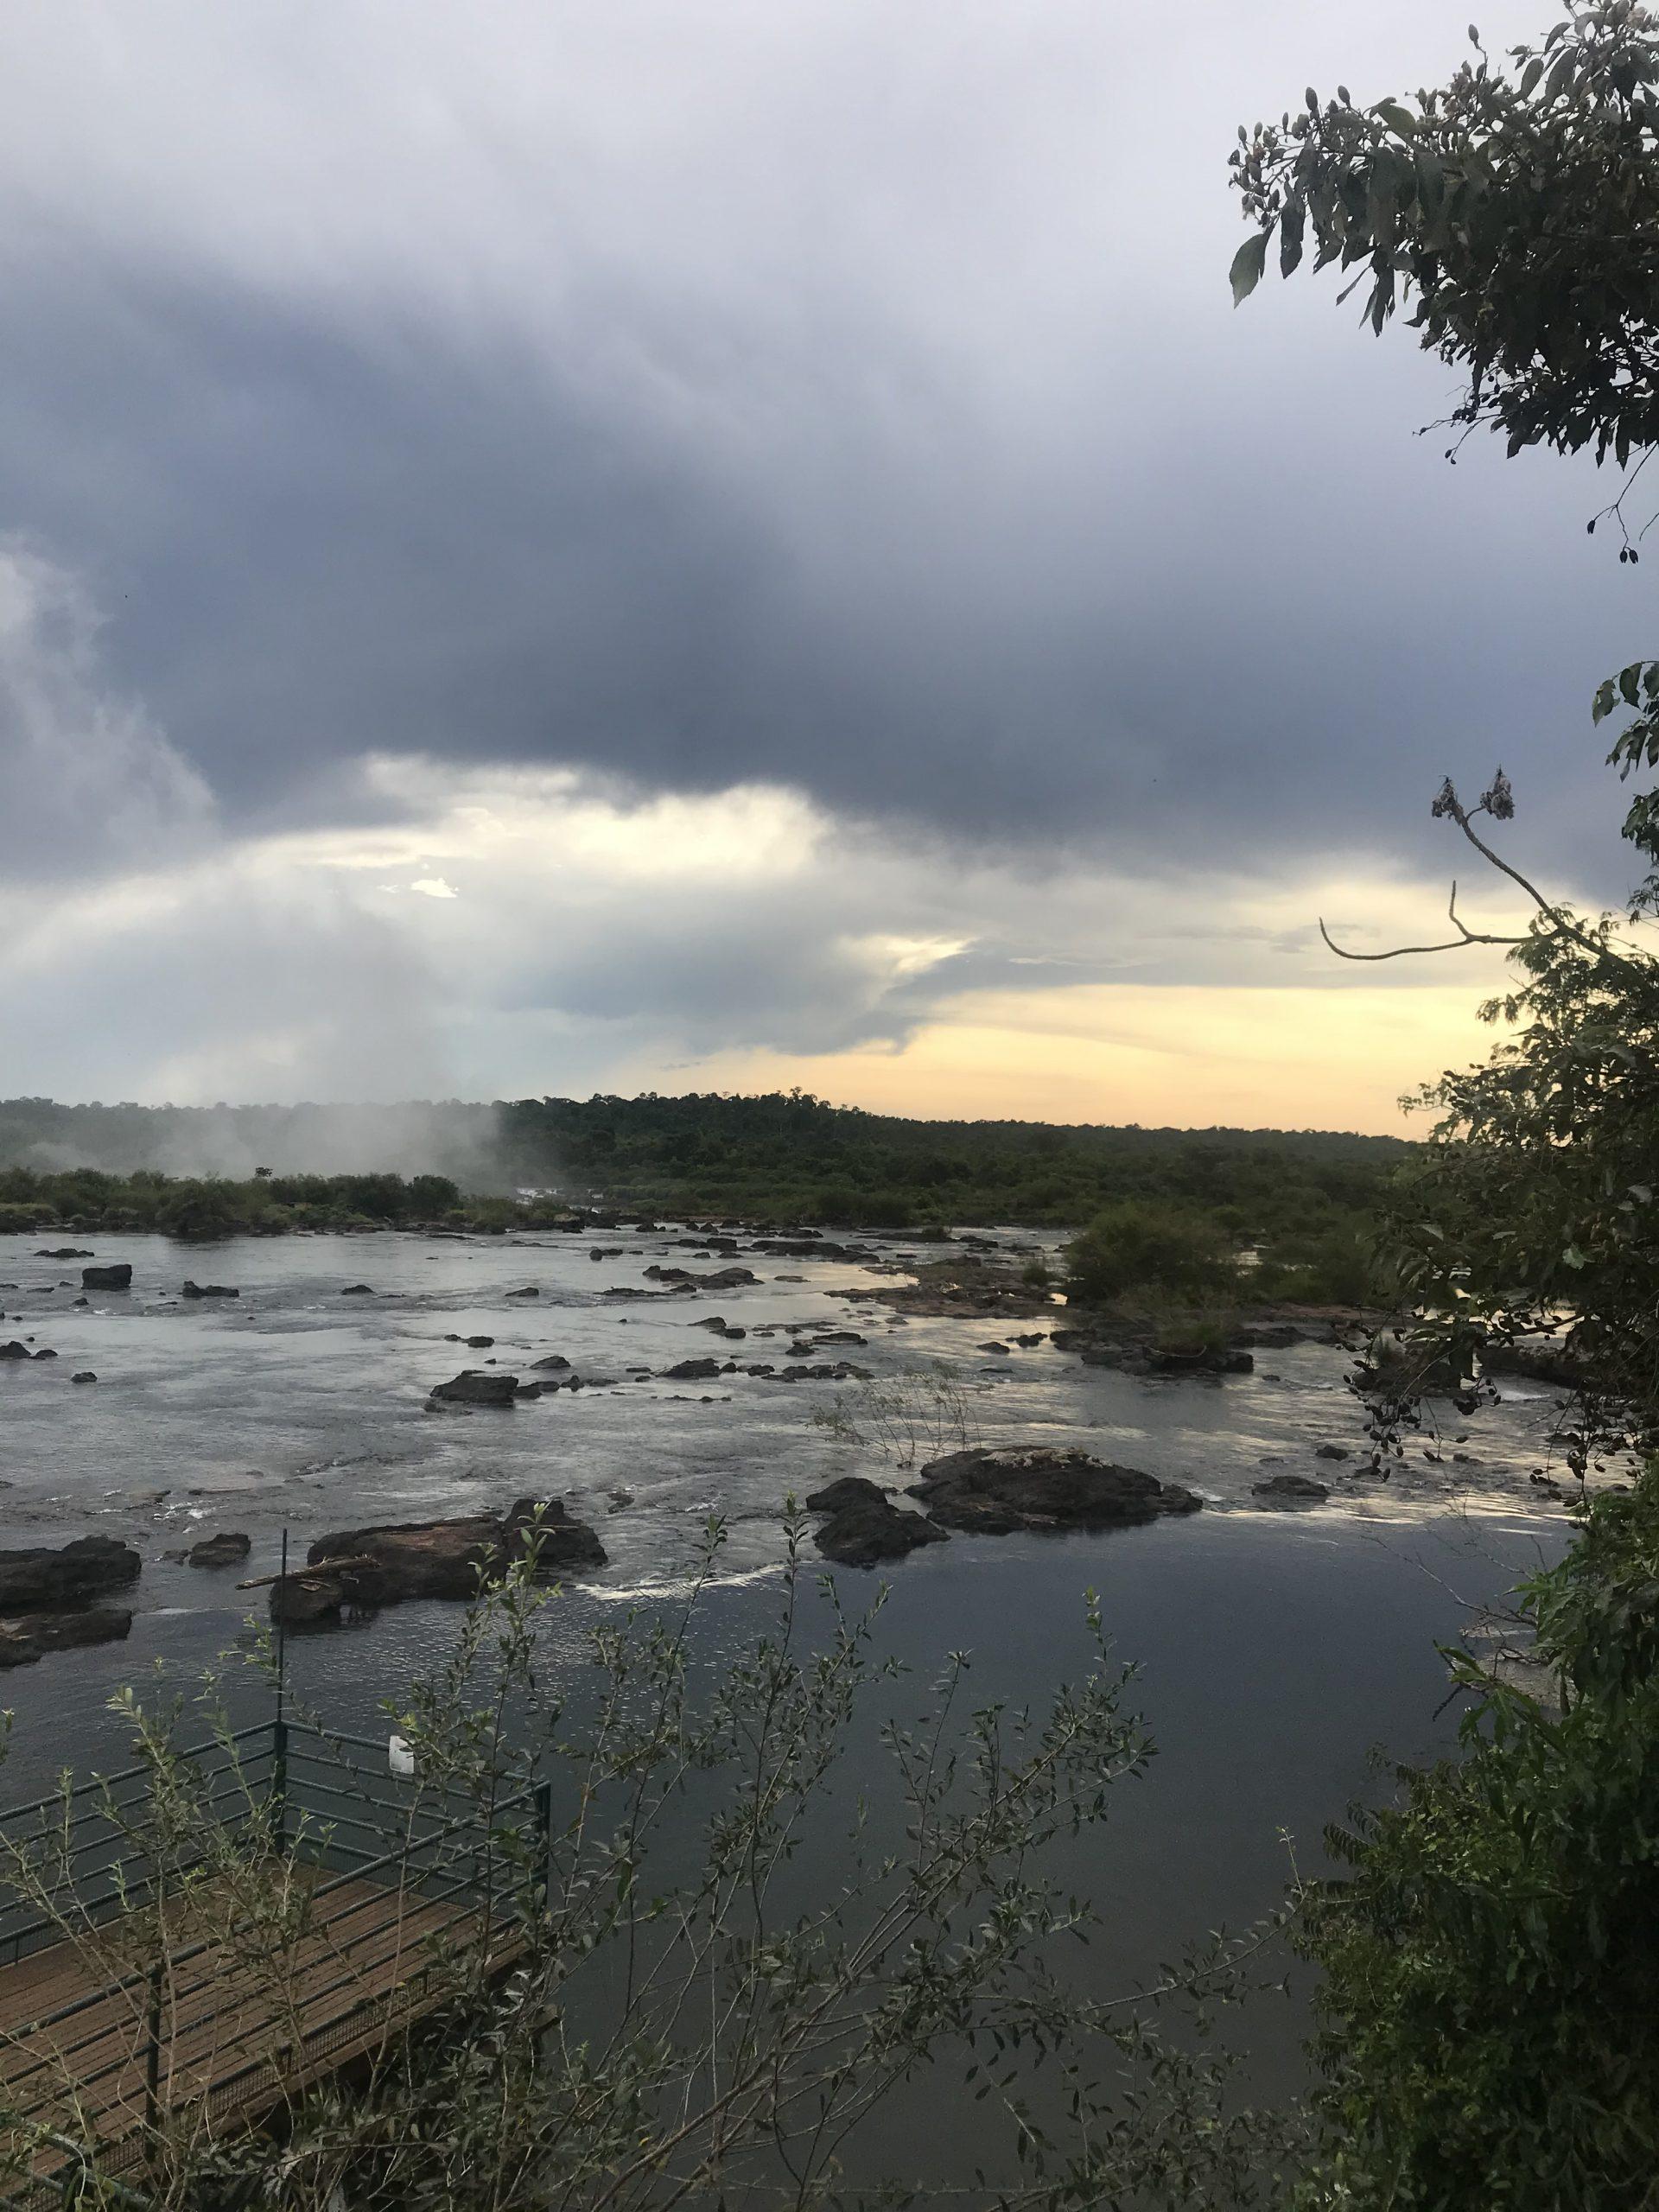 Iguazu River Brazilian side. Photo: Devon Older